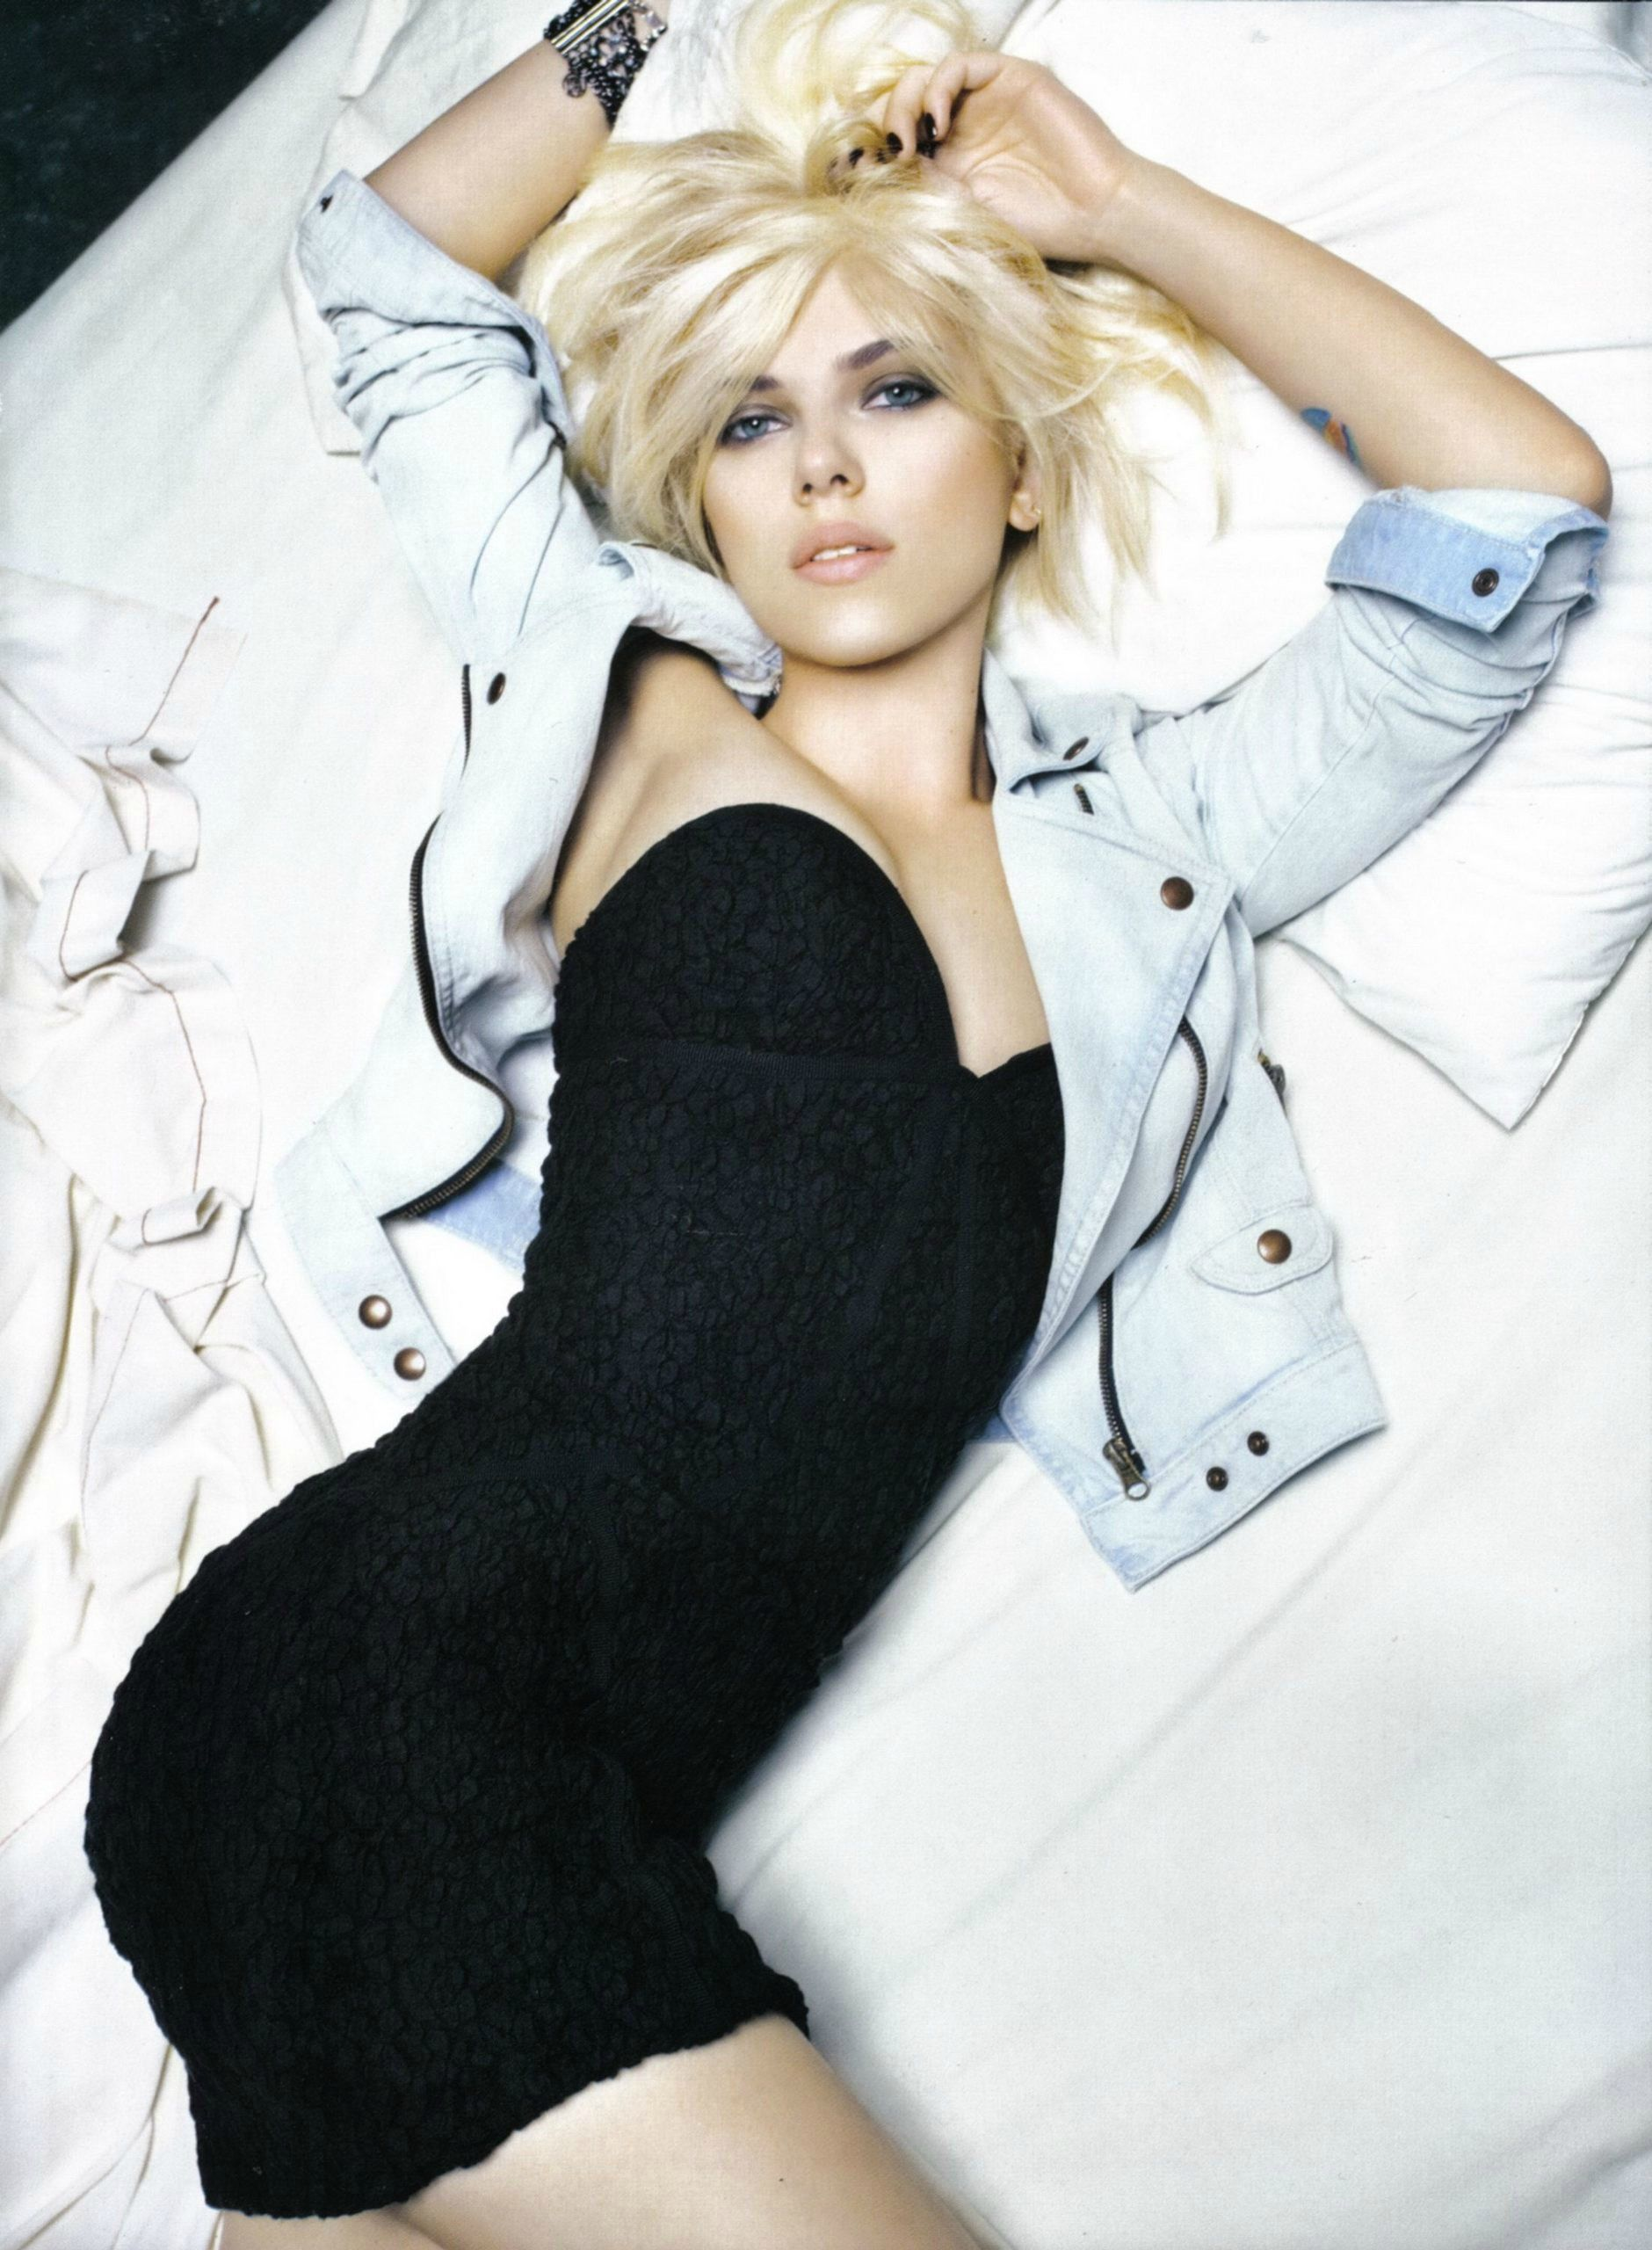 Scarlett strikes a Marilyn, makes me want redlipstick